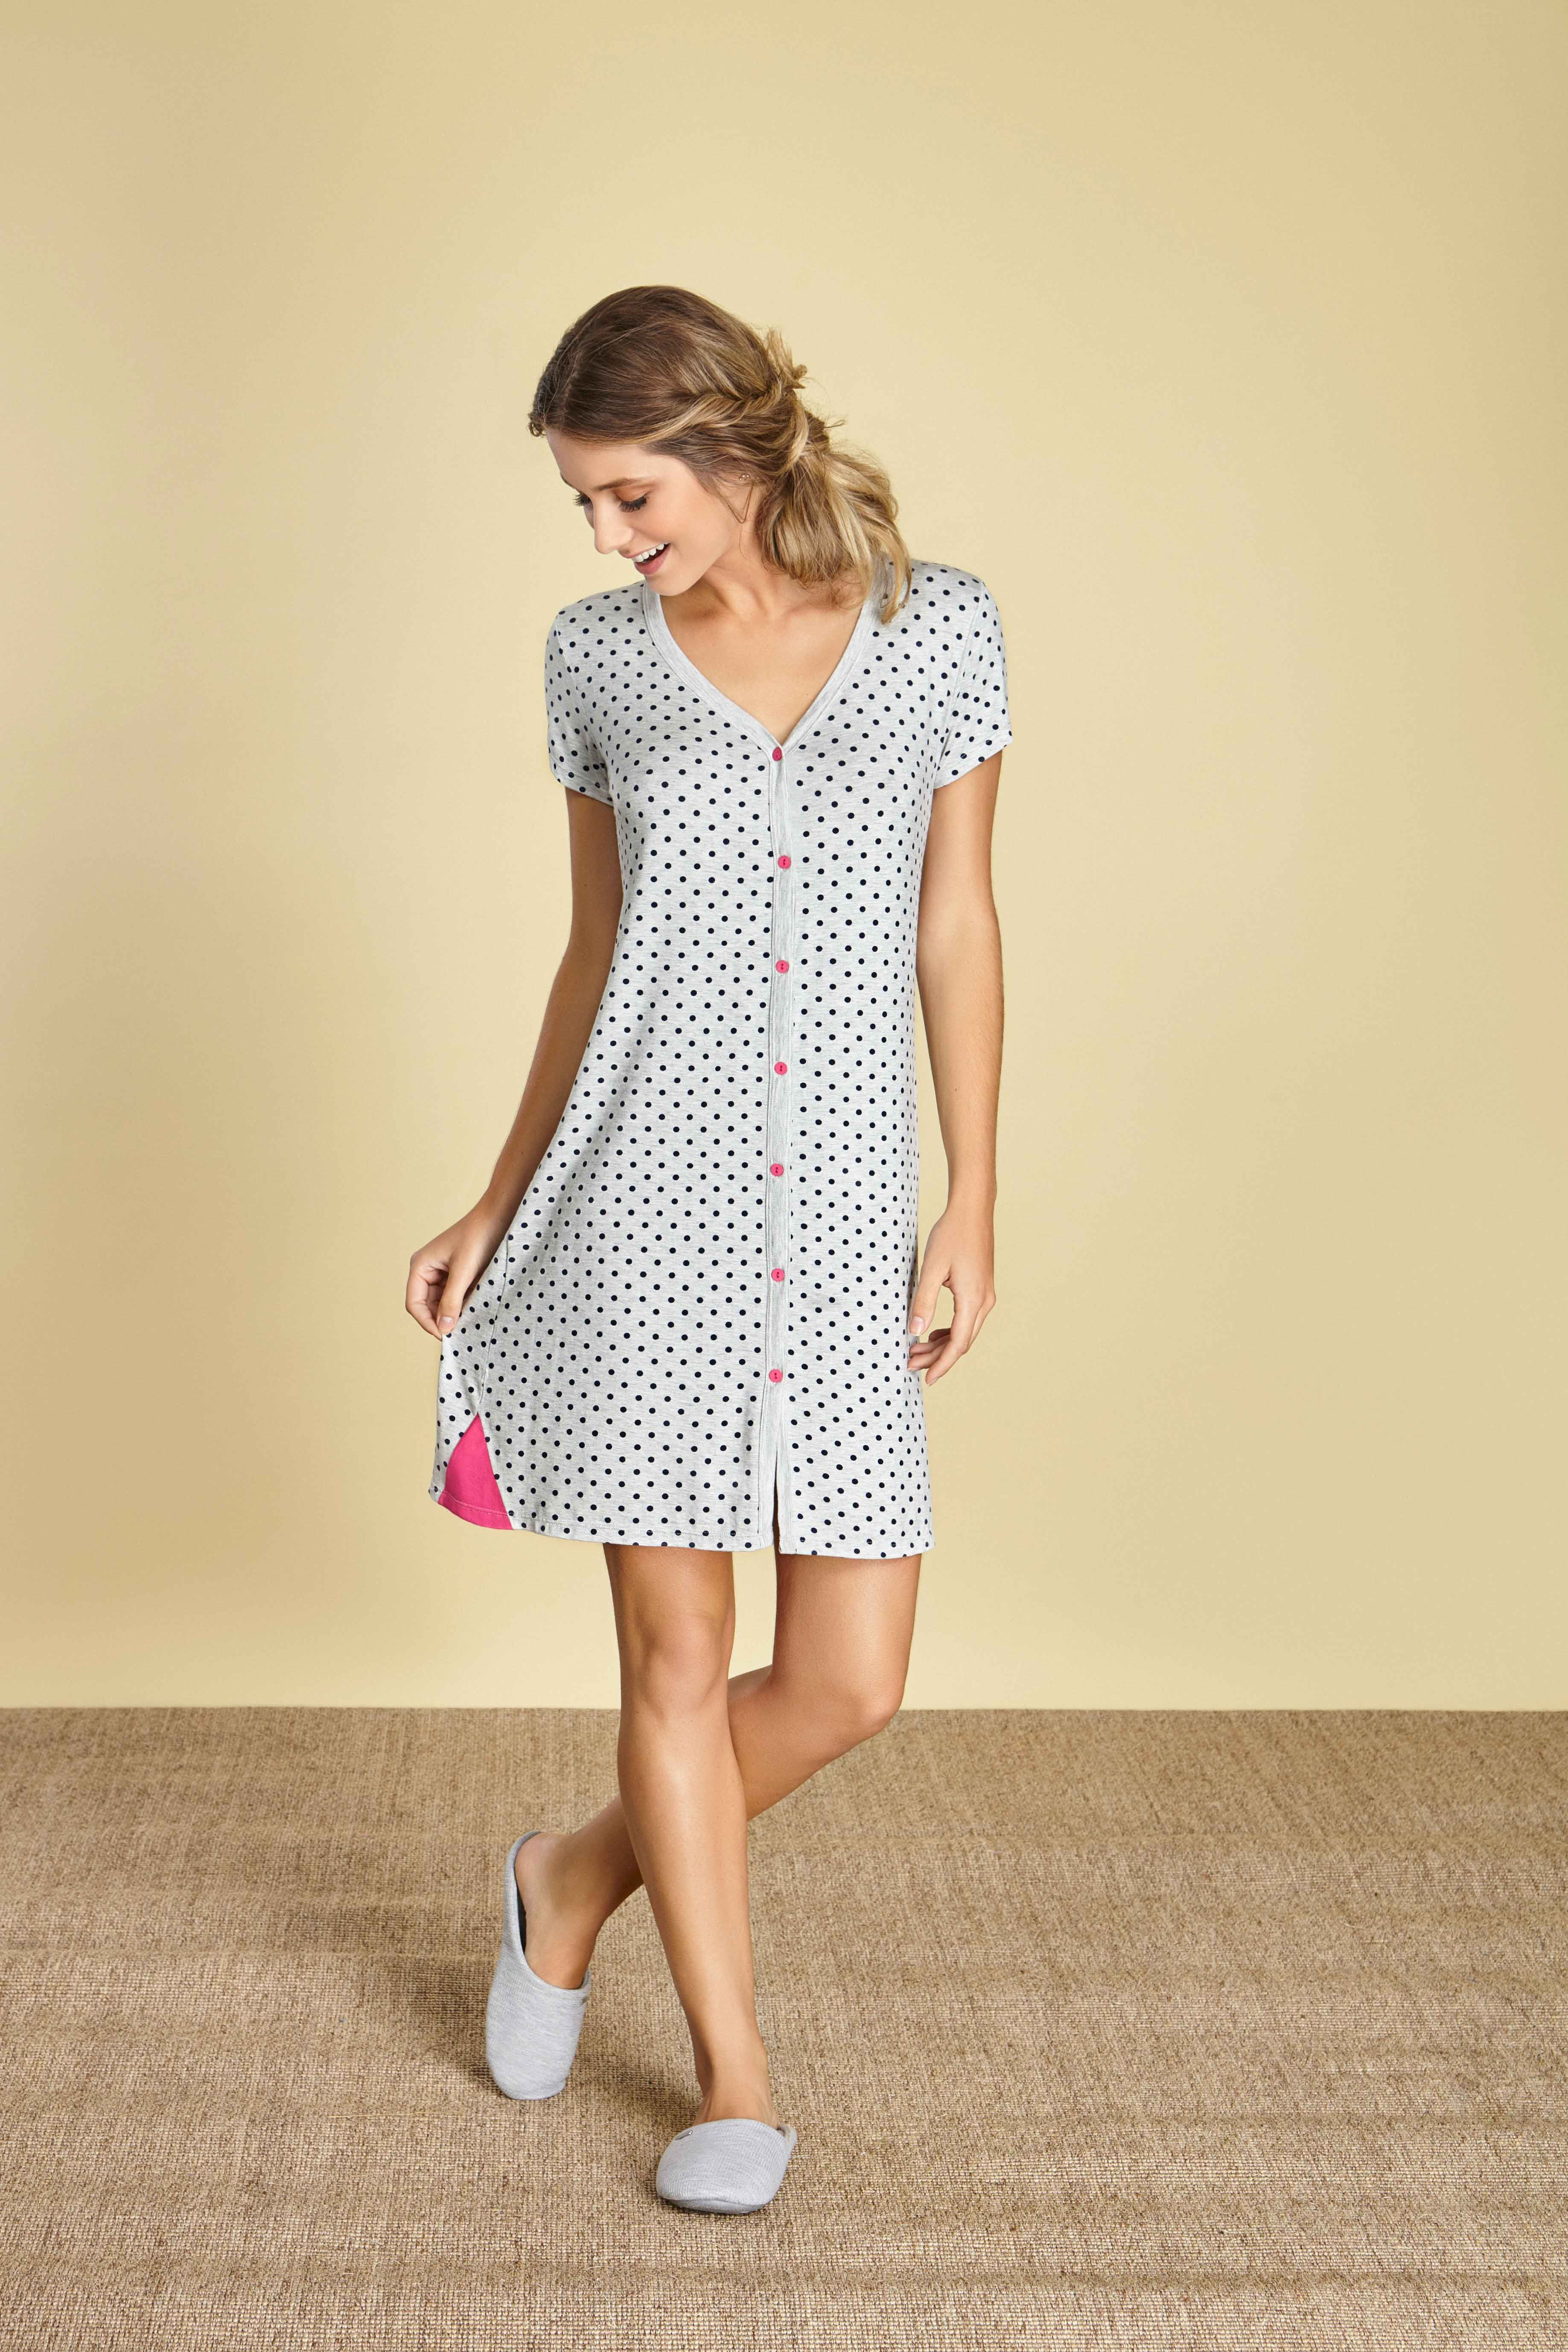 a6af67bd96 Camisolas exclusivas e lindas para todos os seus momentos de maternidade. A  camisola pode ser usada para a maternidade e pós cirurgias.